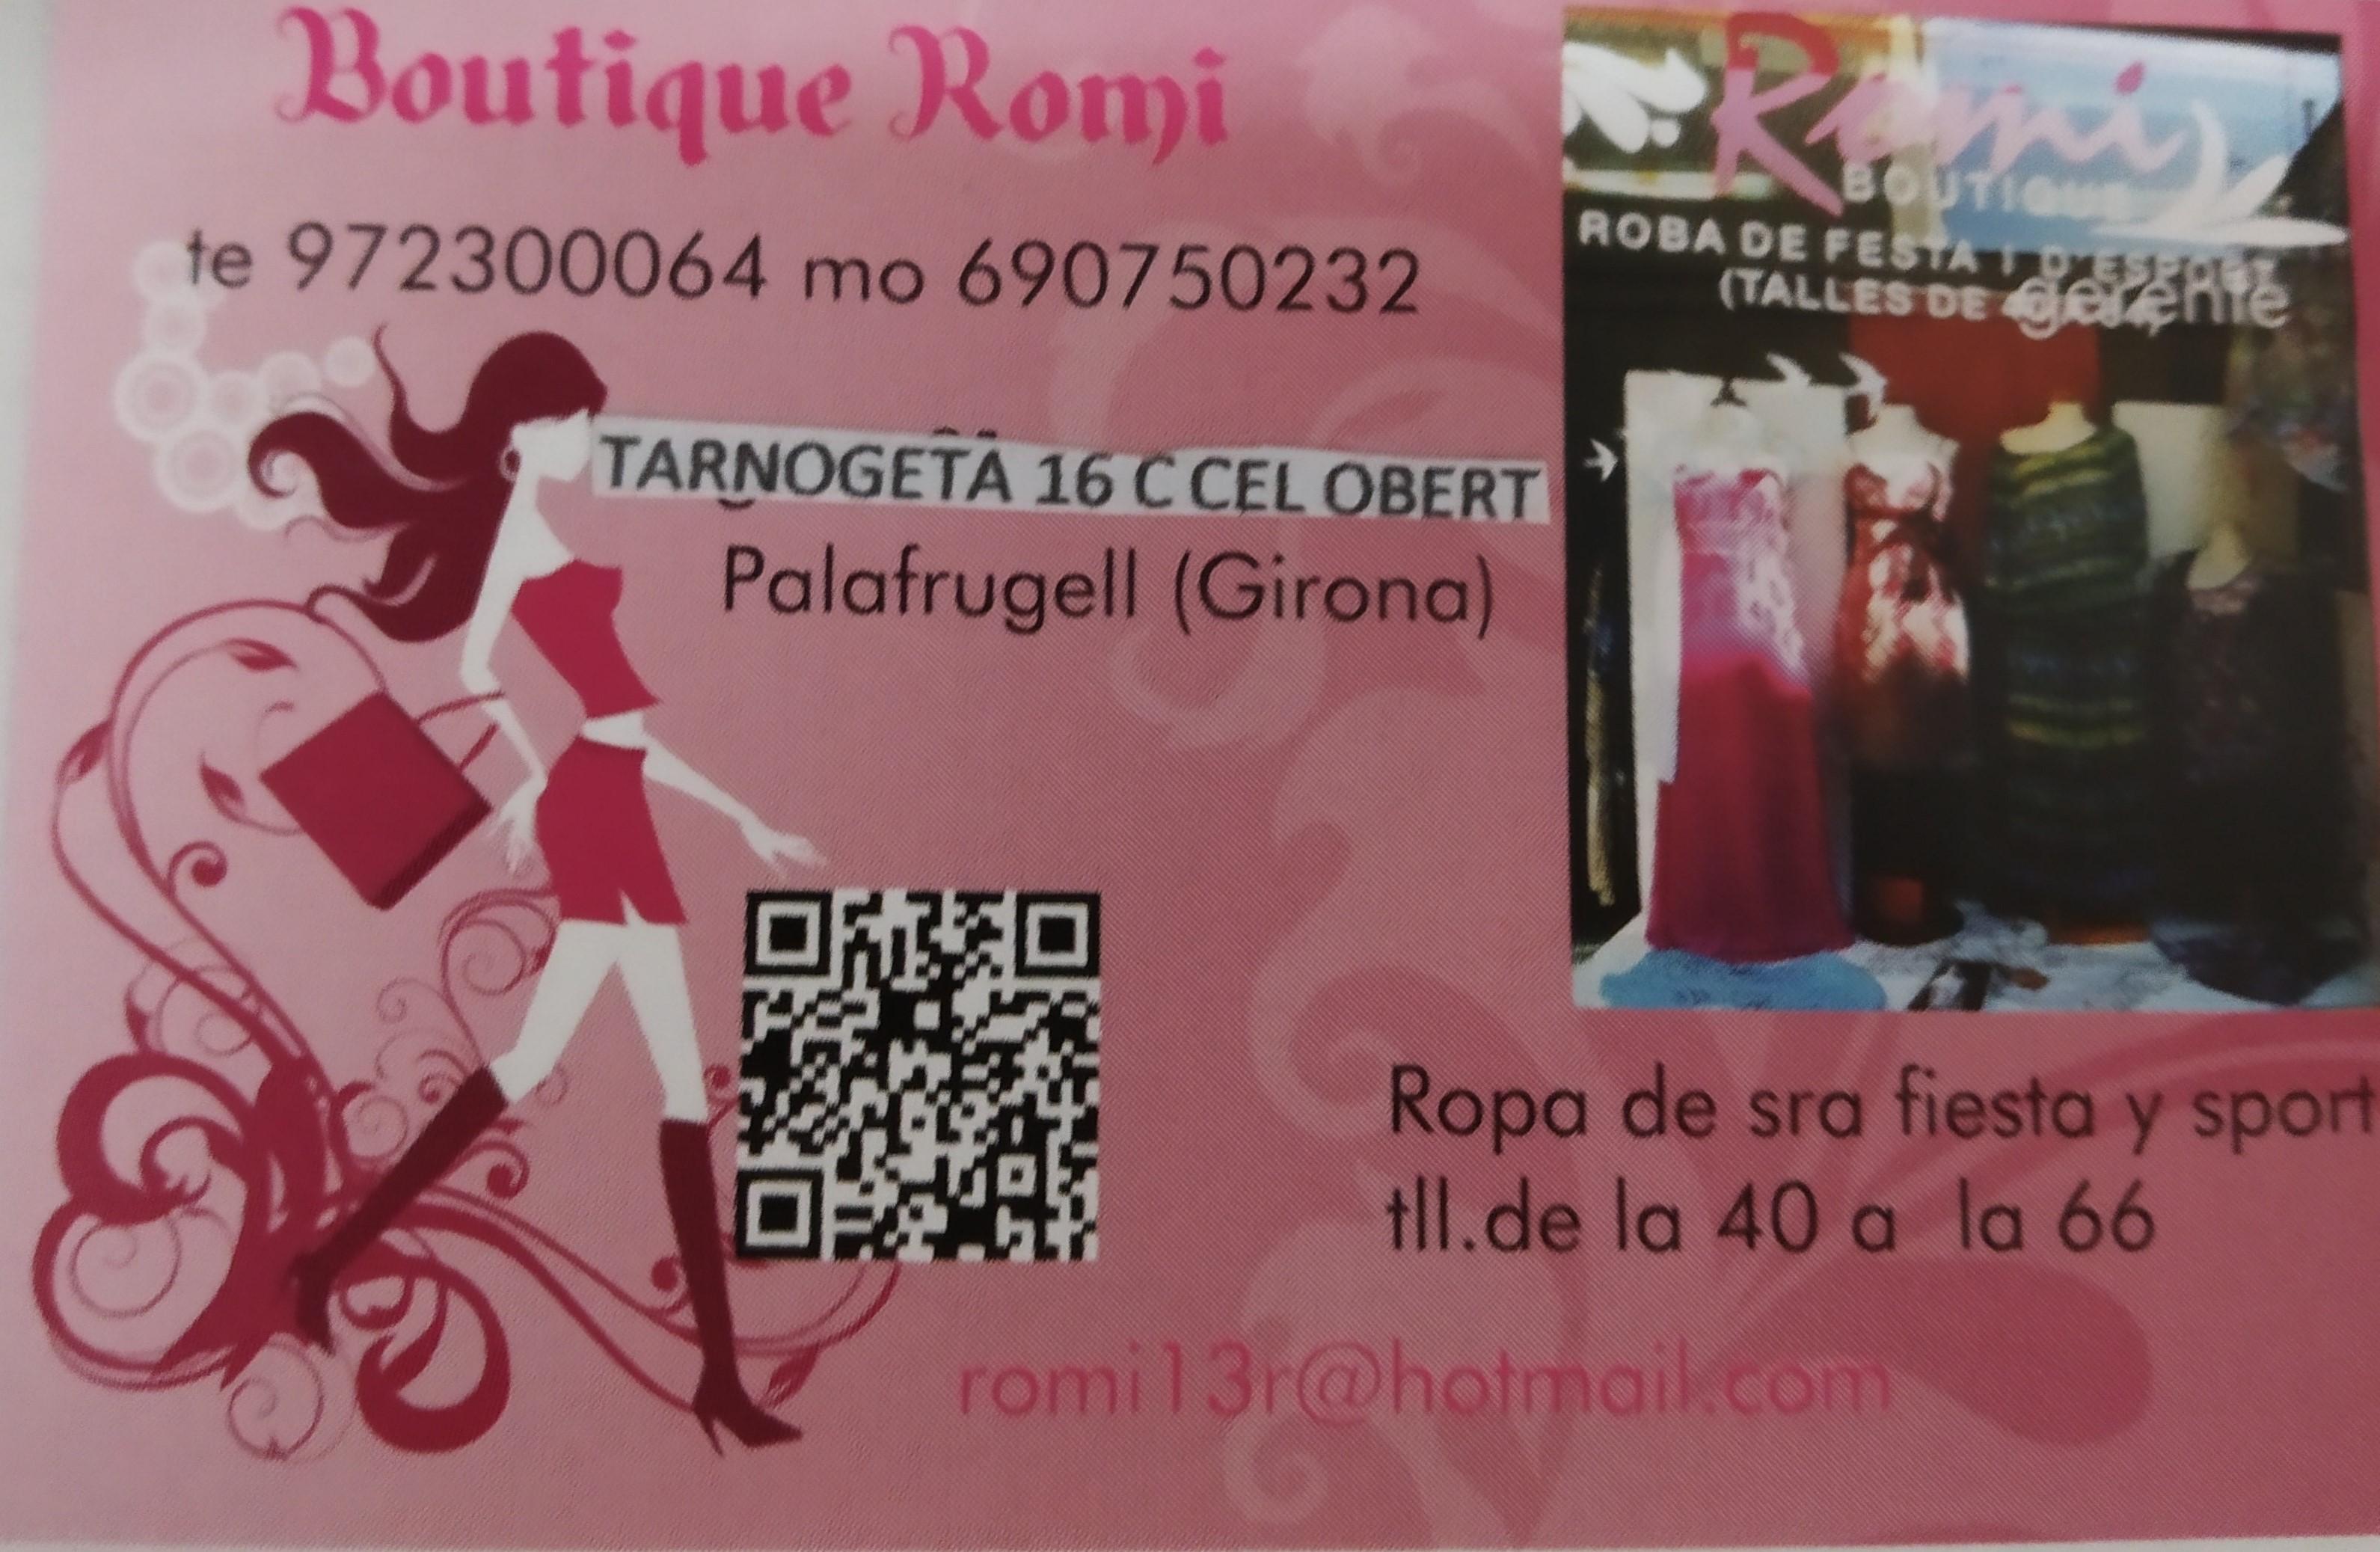 Boutique Romi